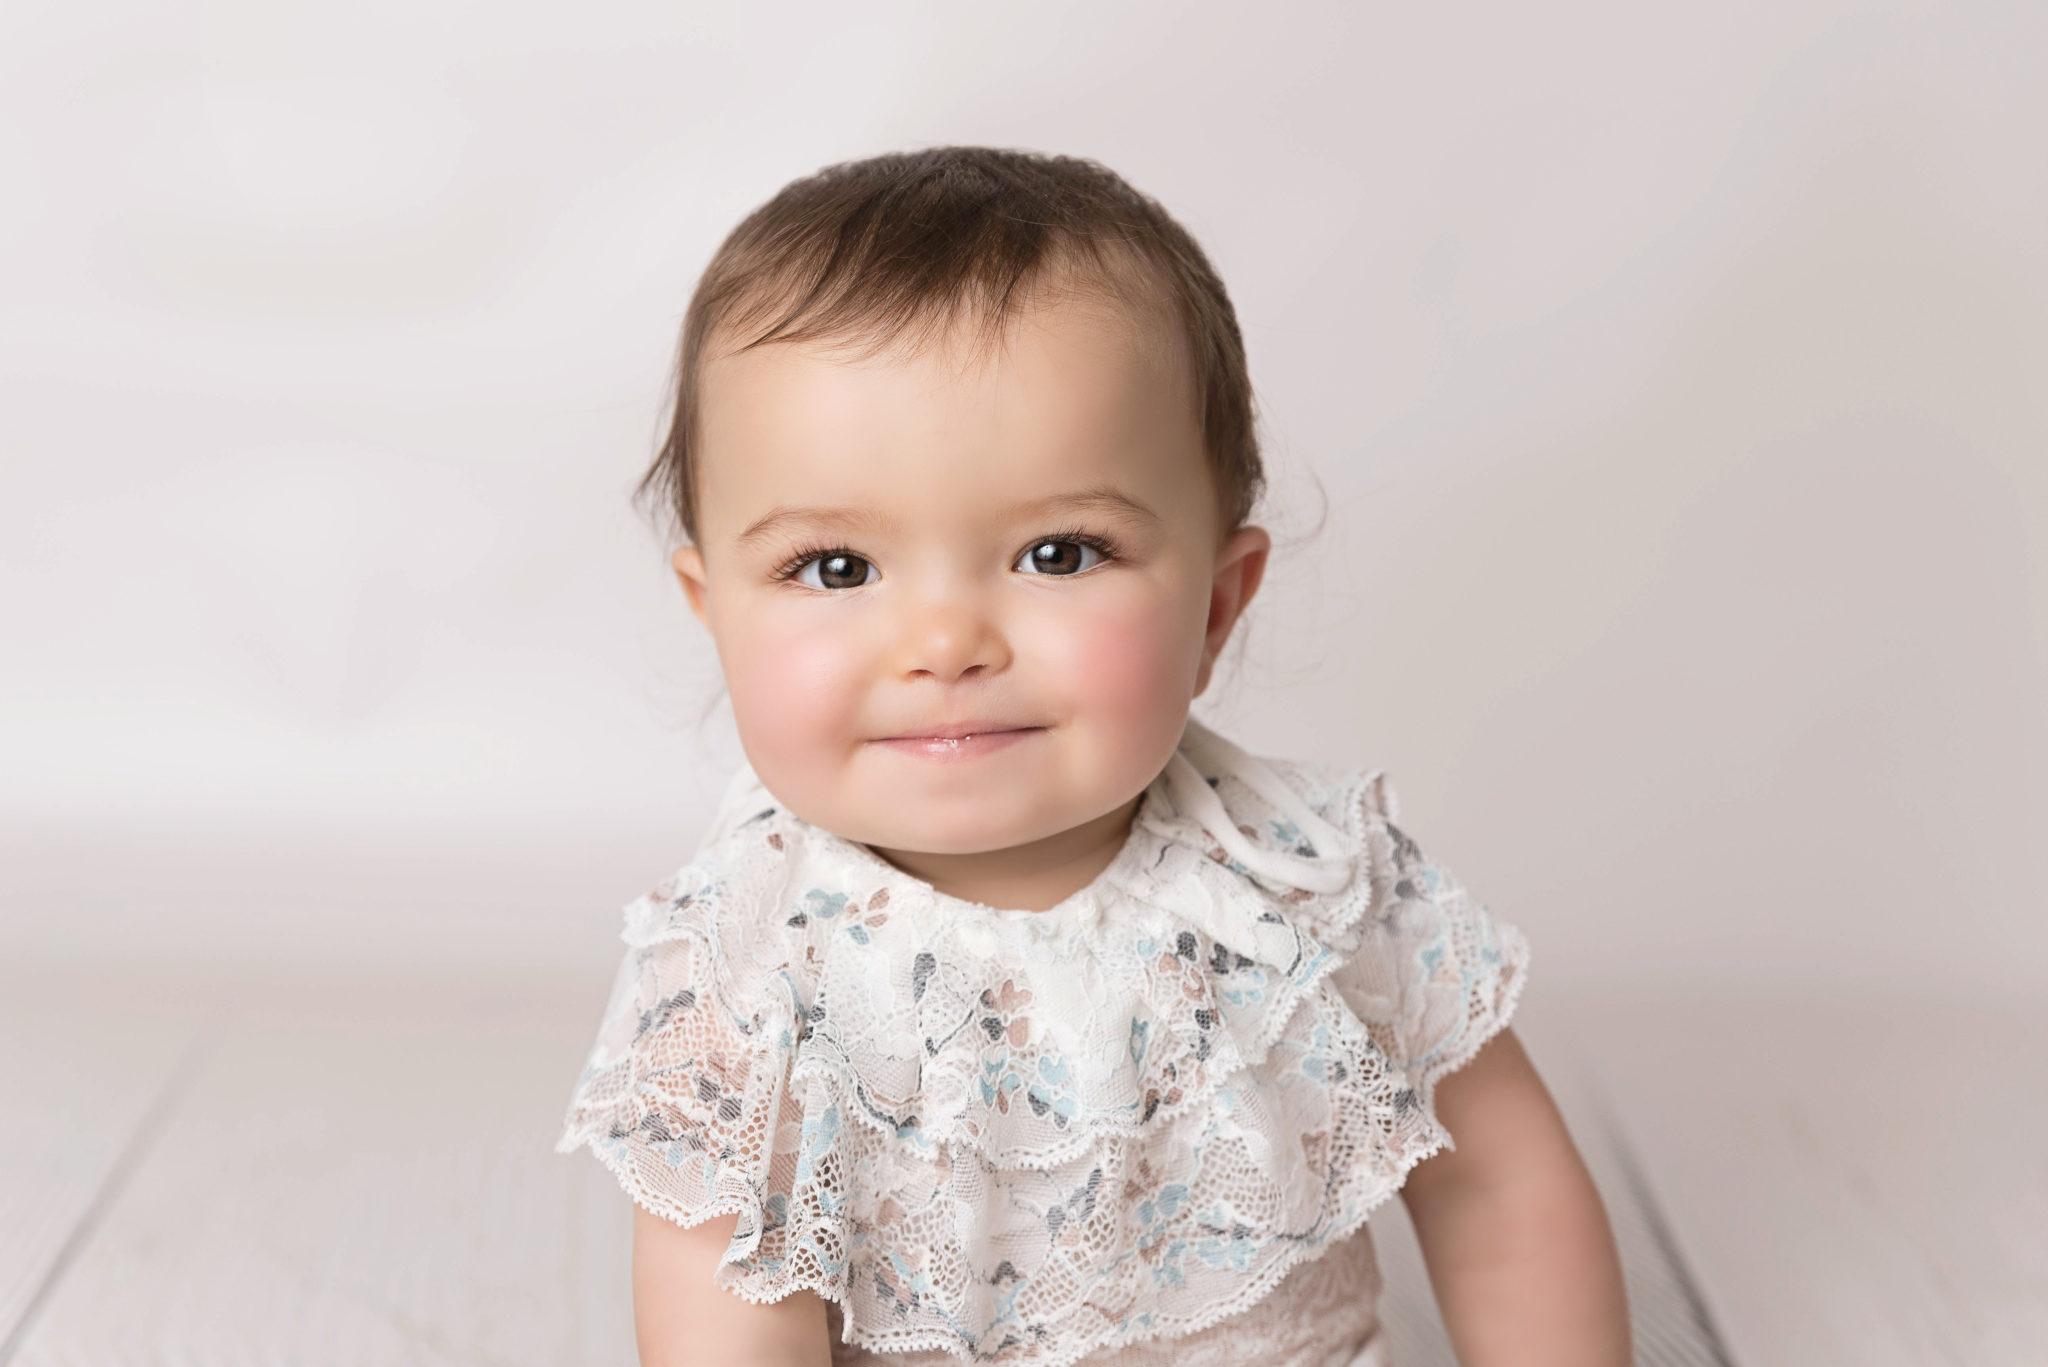 Photographe bébé oise seine et marne val d'oise ainse (21)